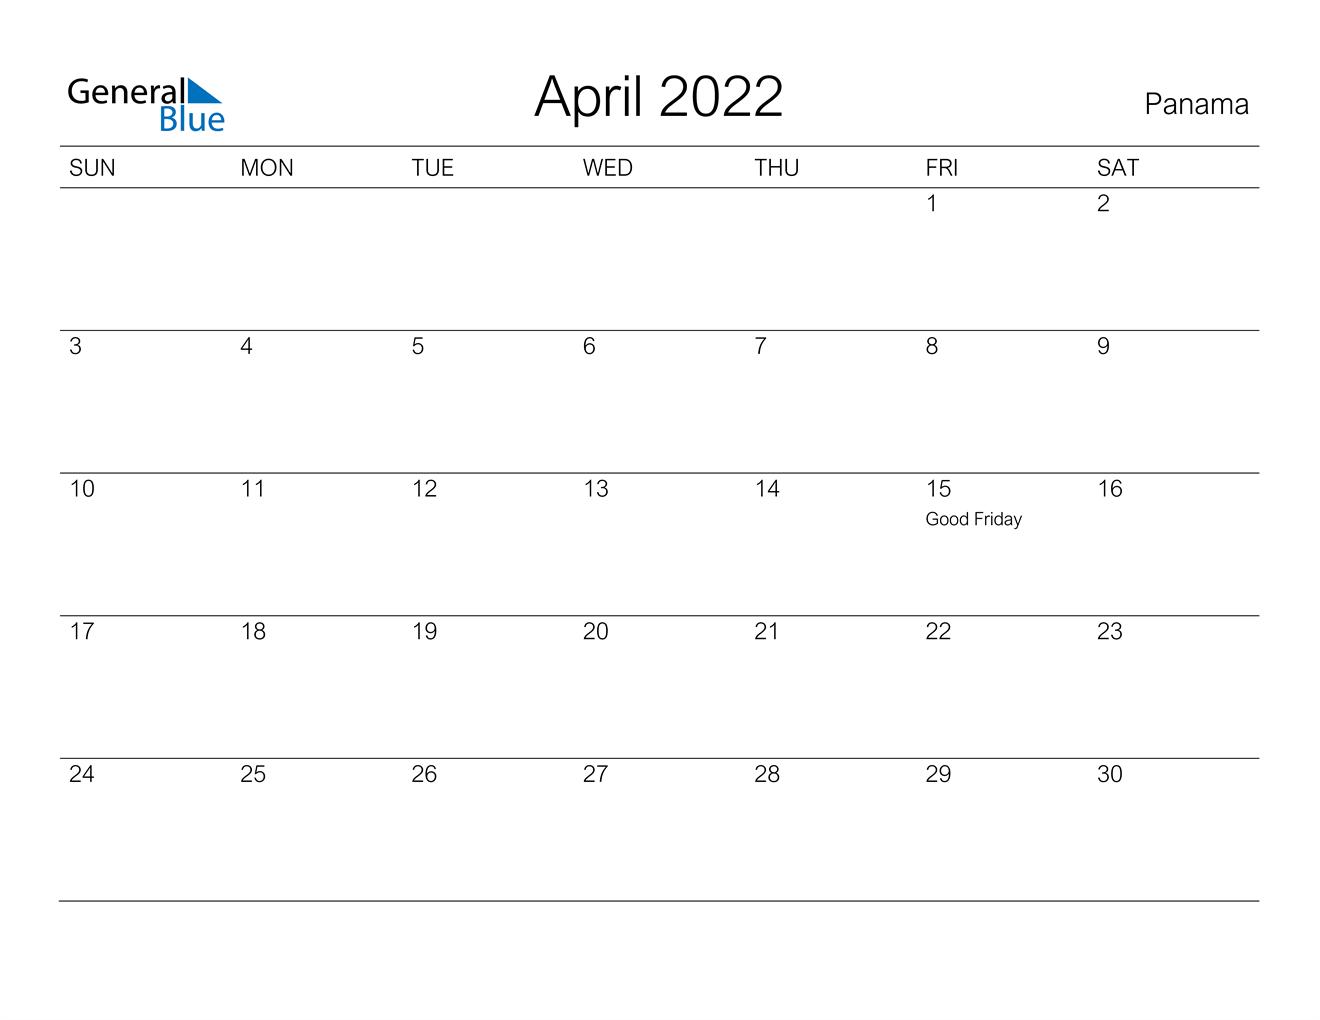 April 2022 Calendar - Panama